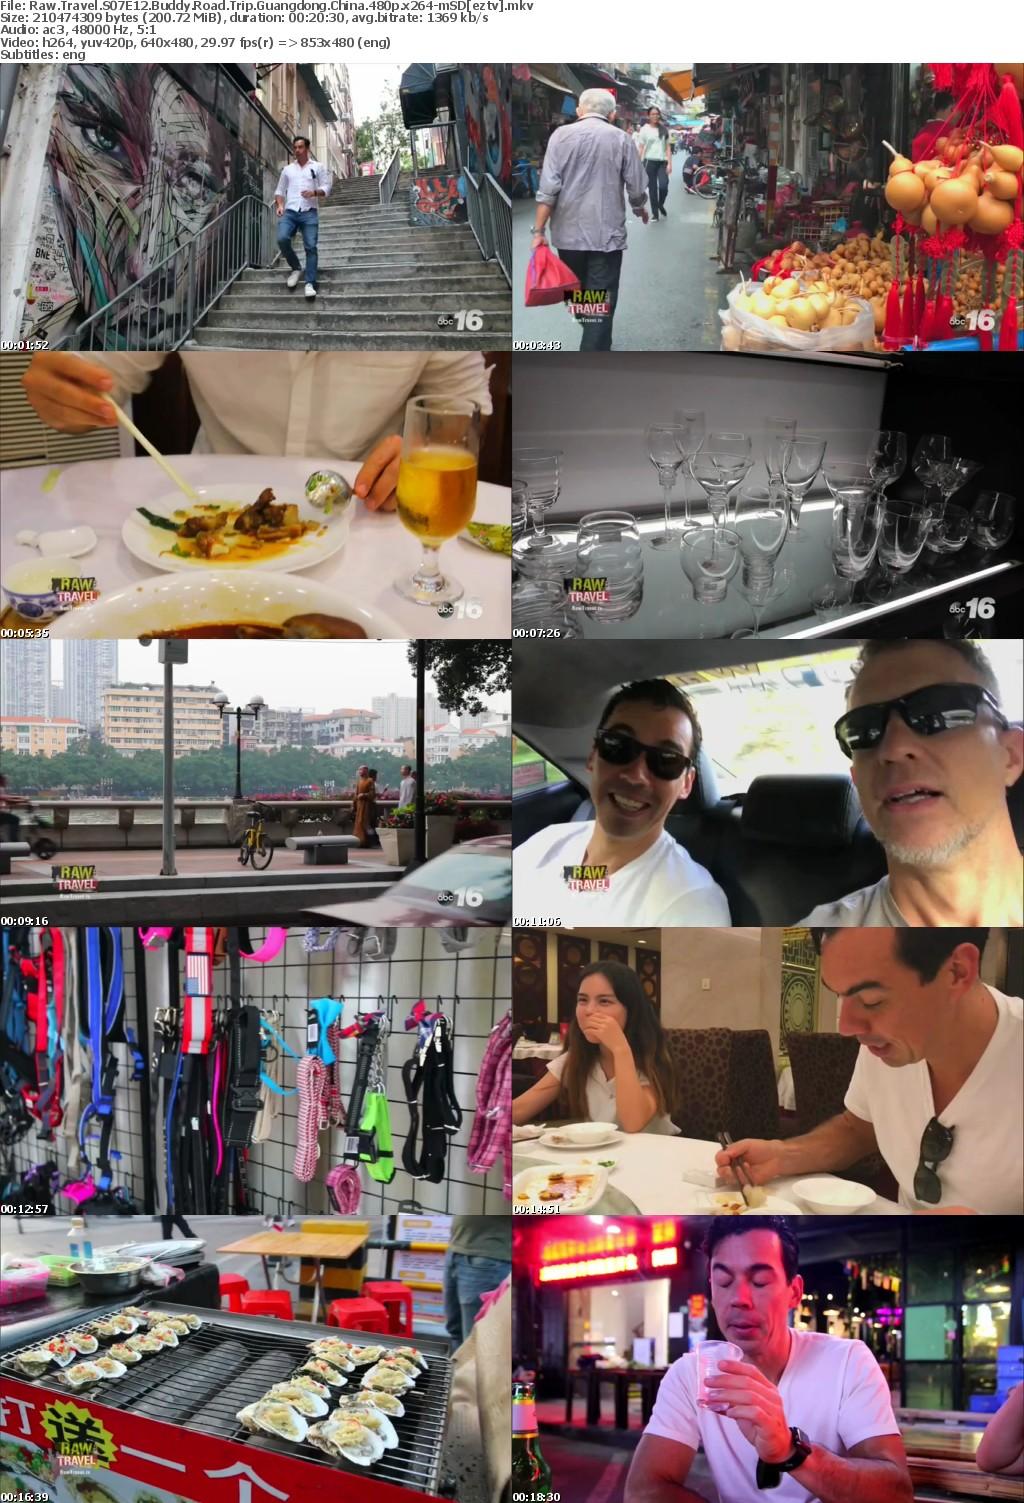 Raw Travel S07E12 Buddy Road Trip Guangdong China 480p x264-mSD